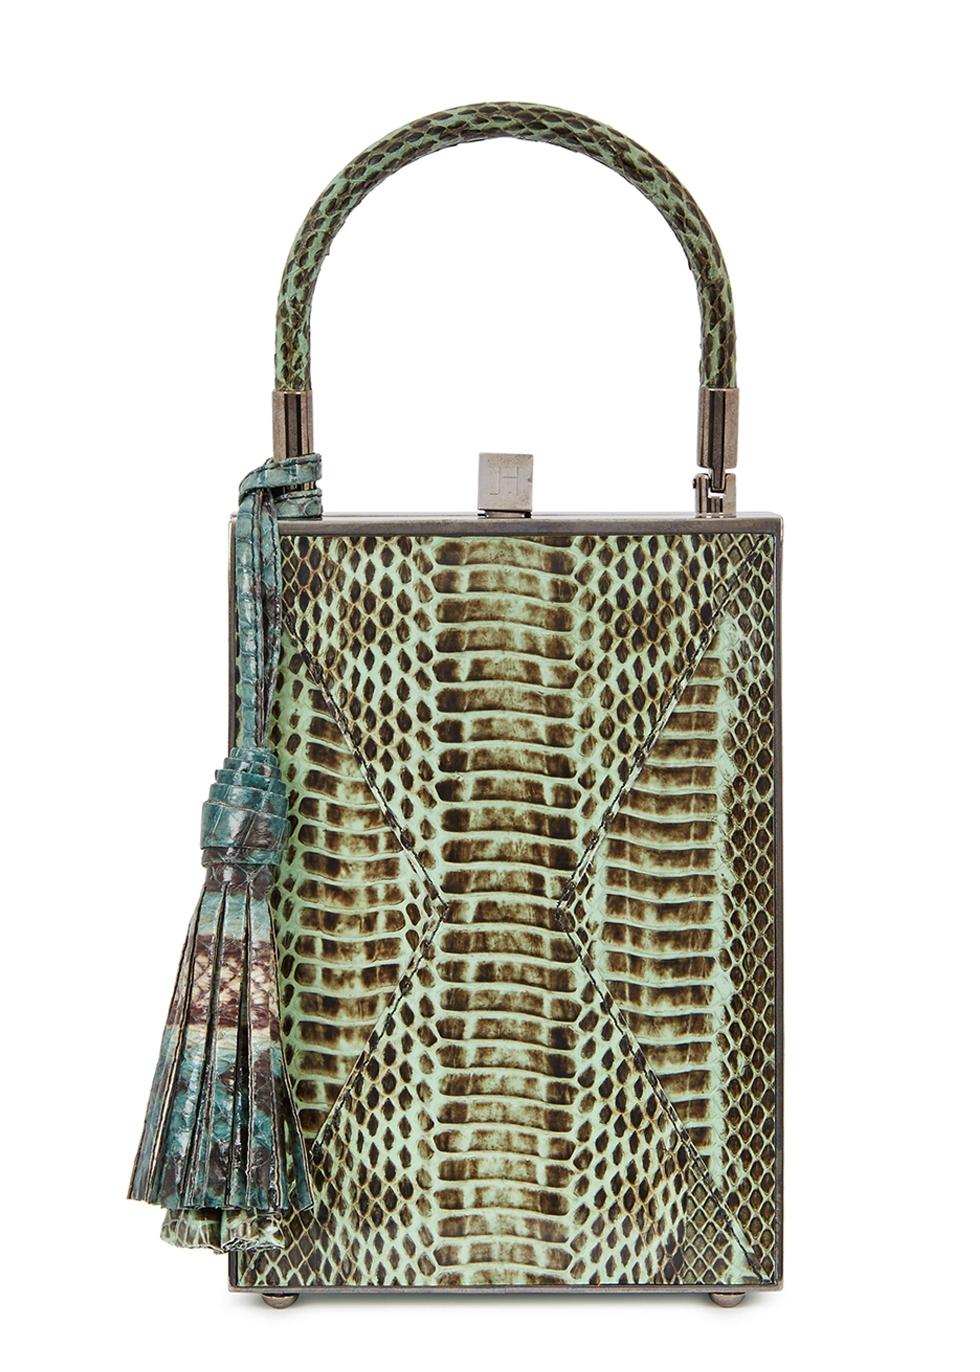 JILL HABER NILES DARK GREEN OSTRICH BOX BAG